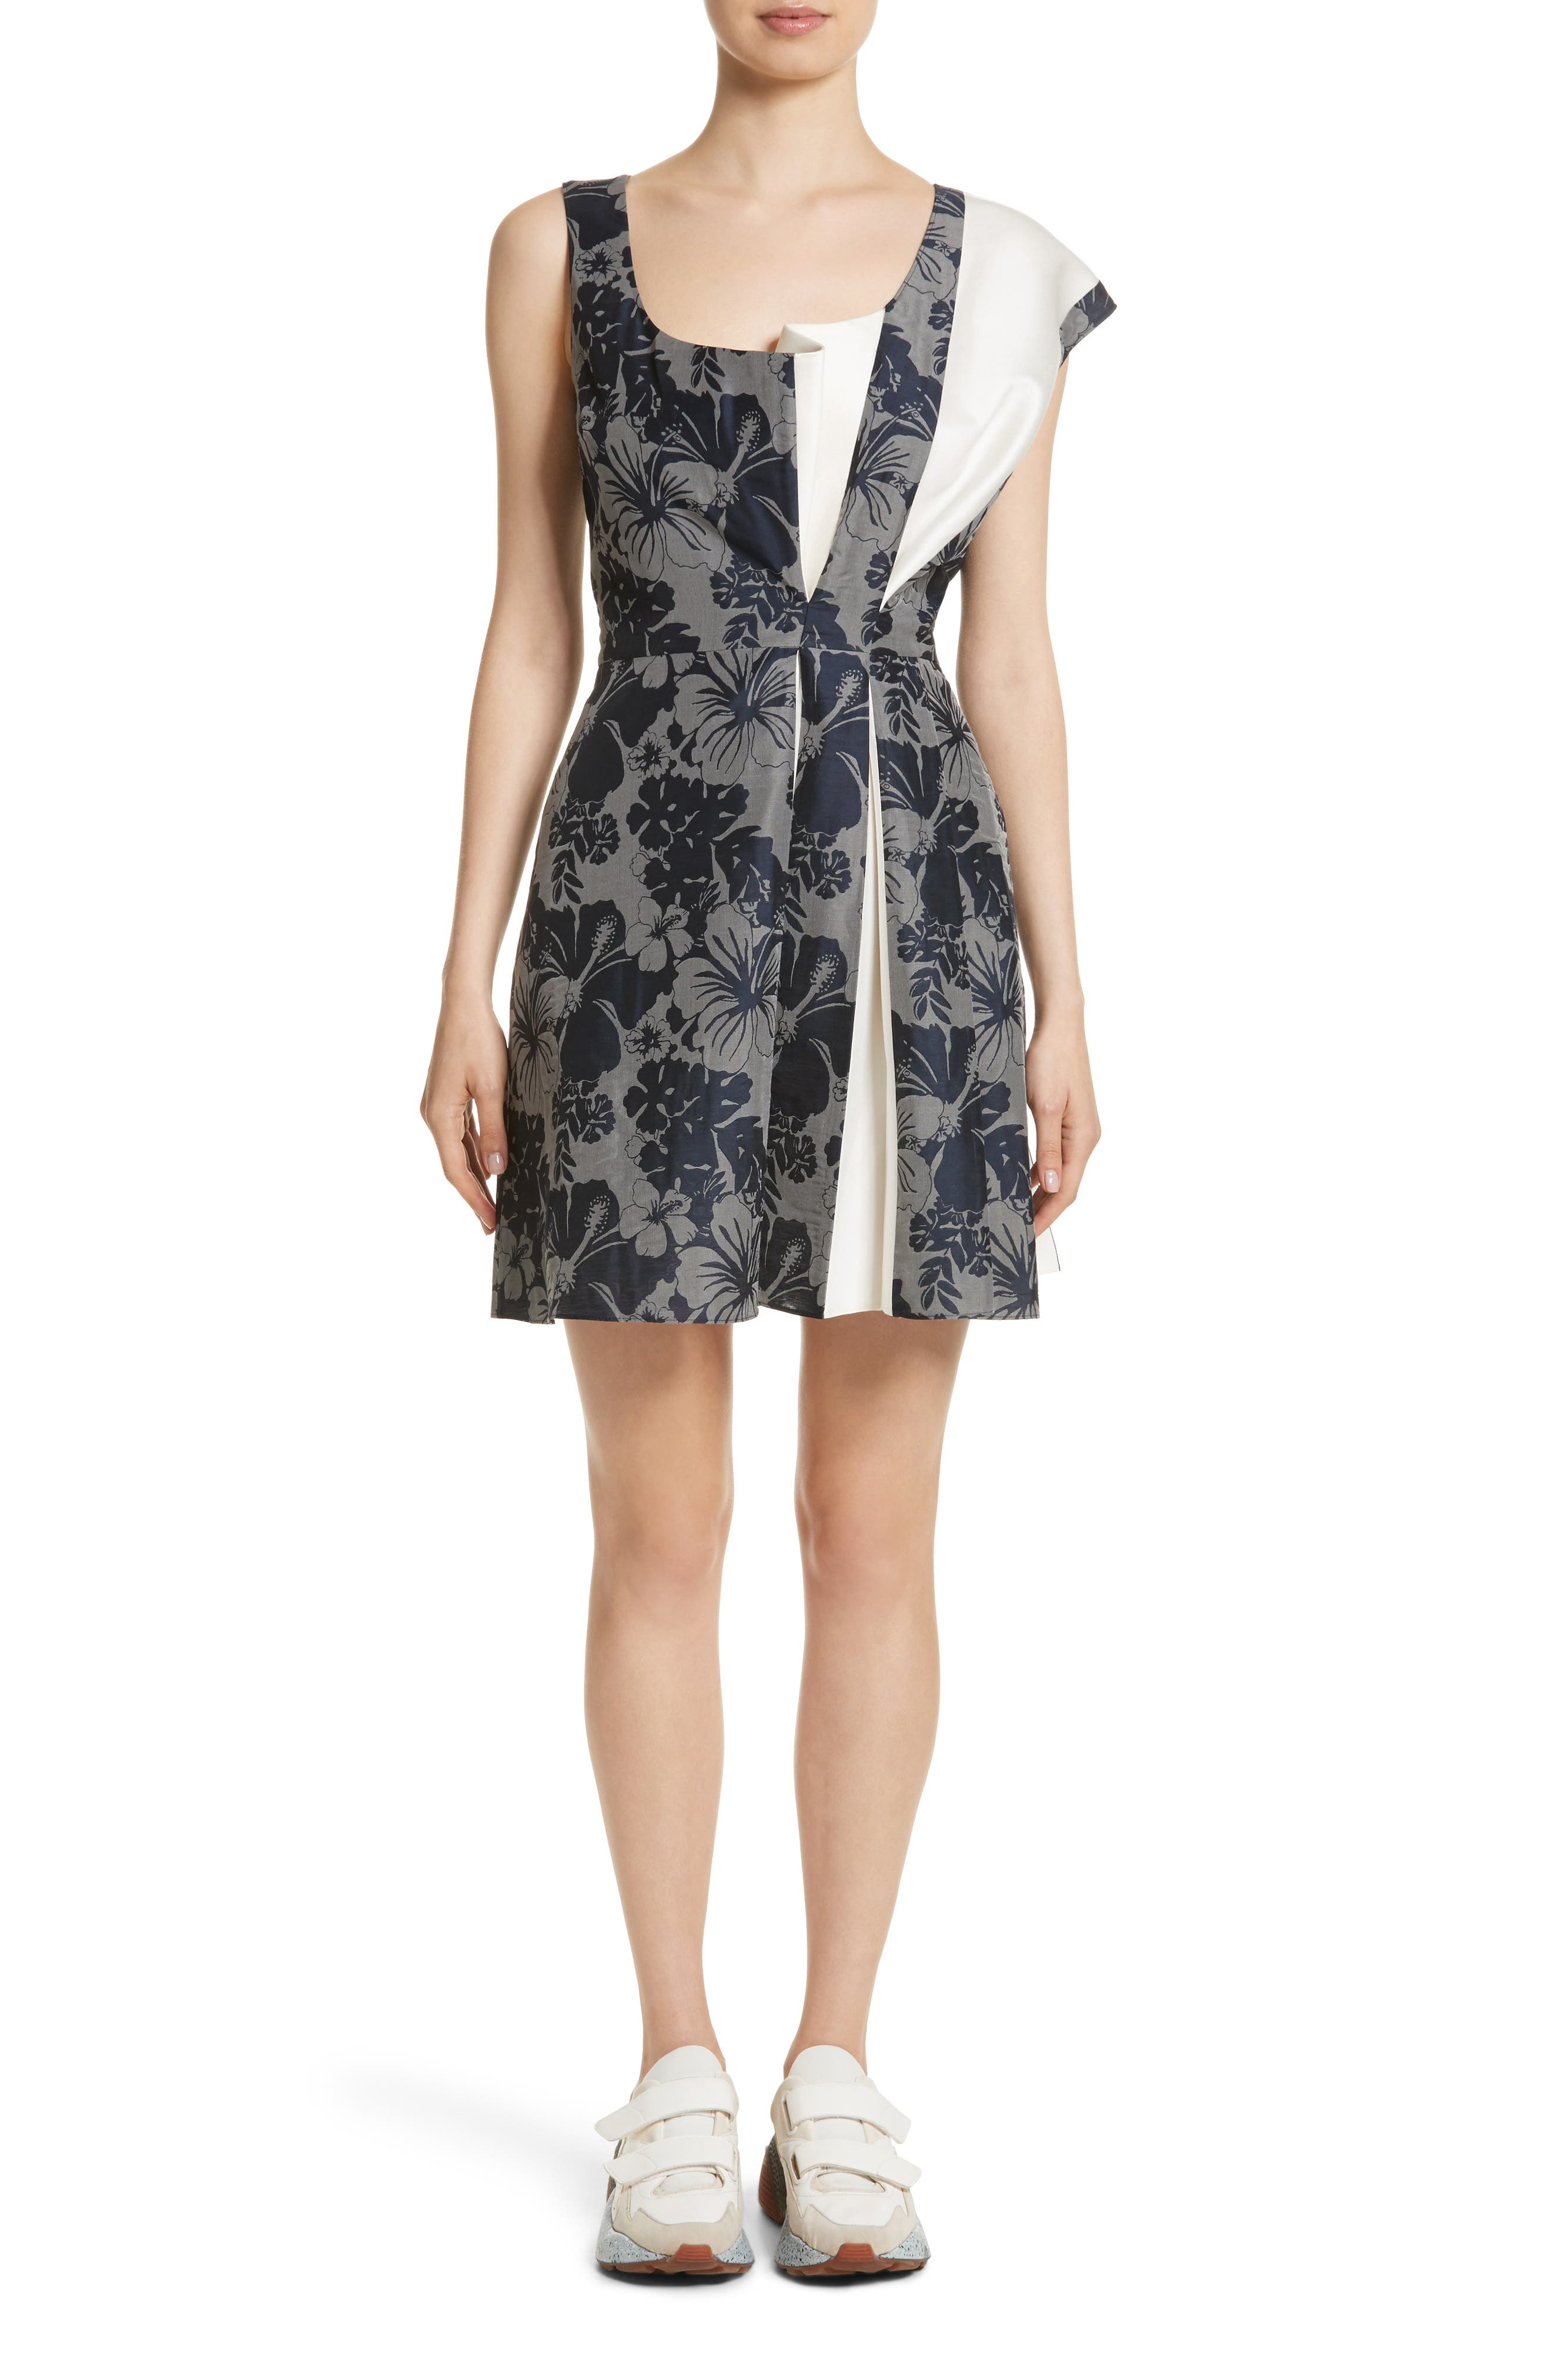 Alternate Image 1 Selected - Stella McCartney Pleated Floral Jacquard Dress